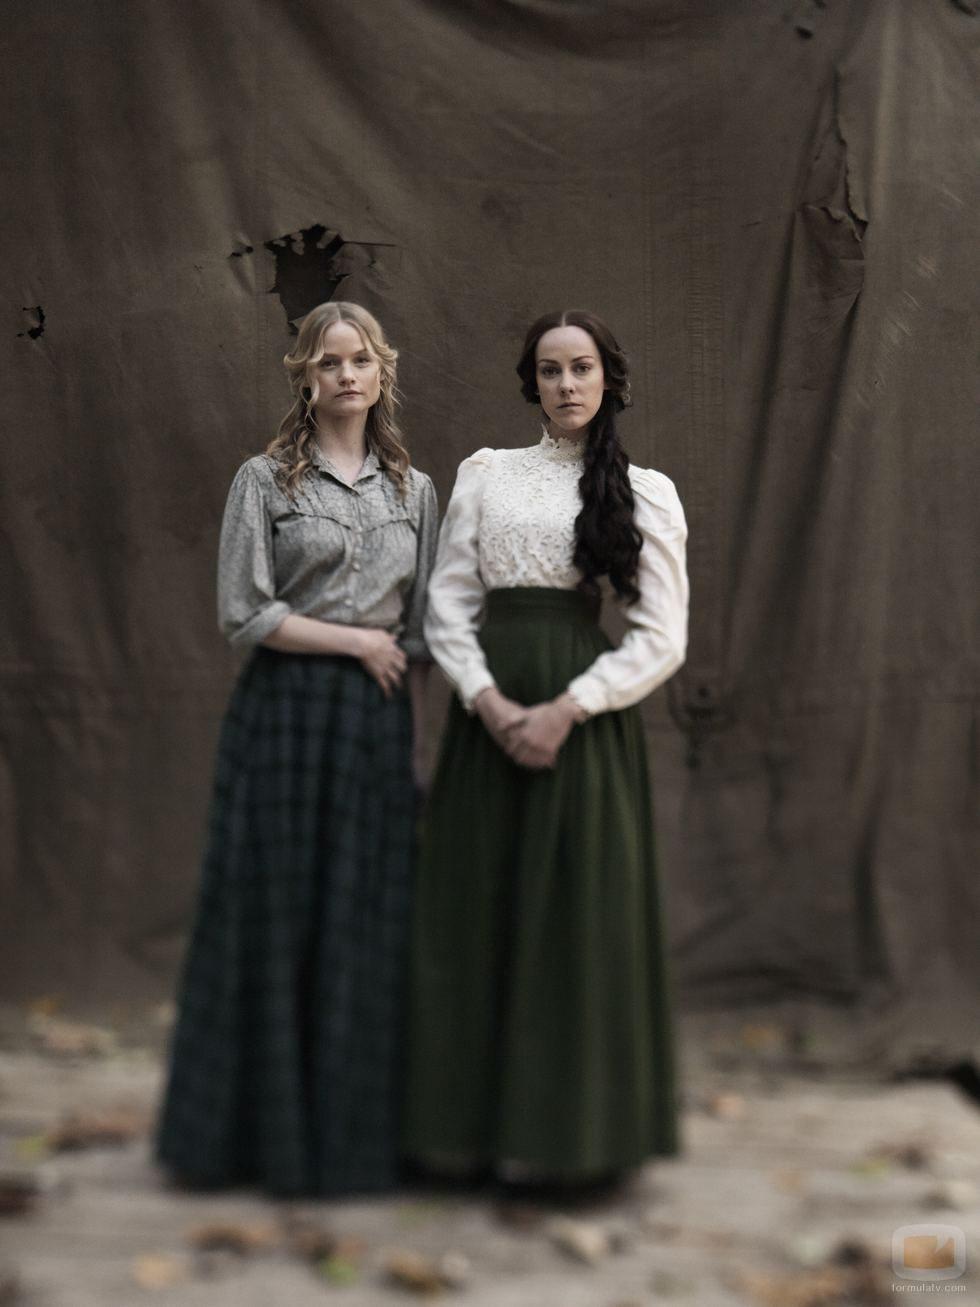 Lindsay Pulsipher y Jena Malone son Roseanna y Nancy McCoy en 'Hatfields & McCoys'